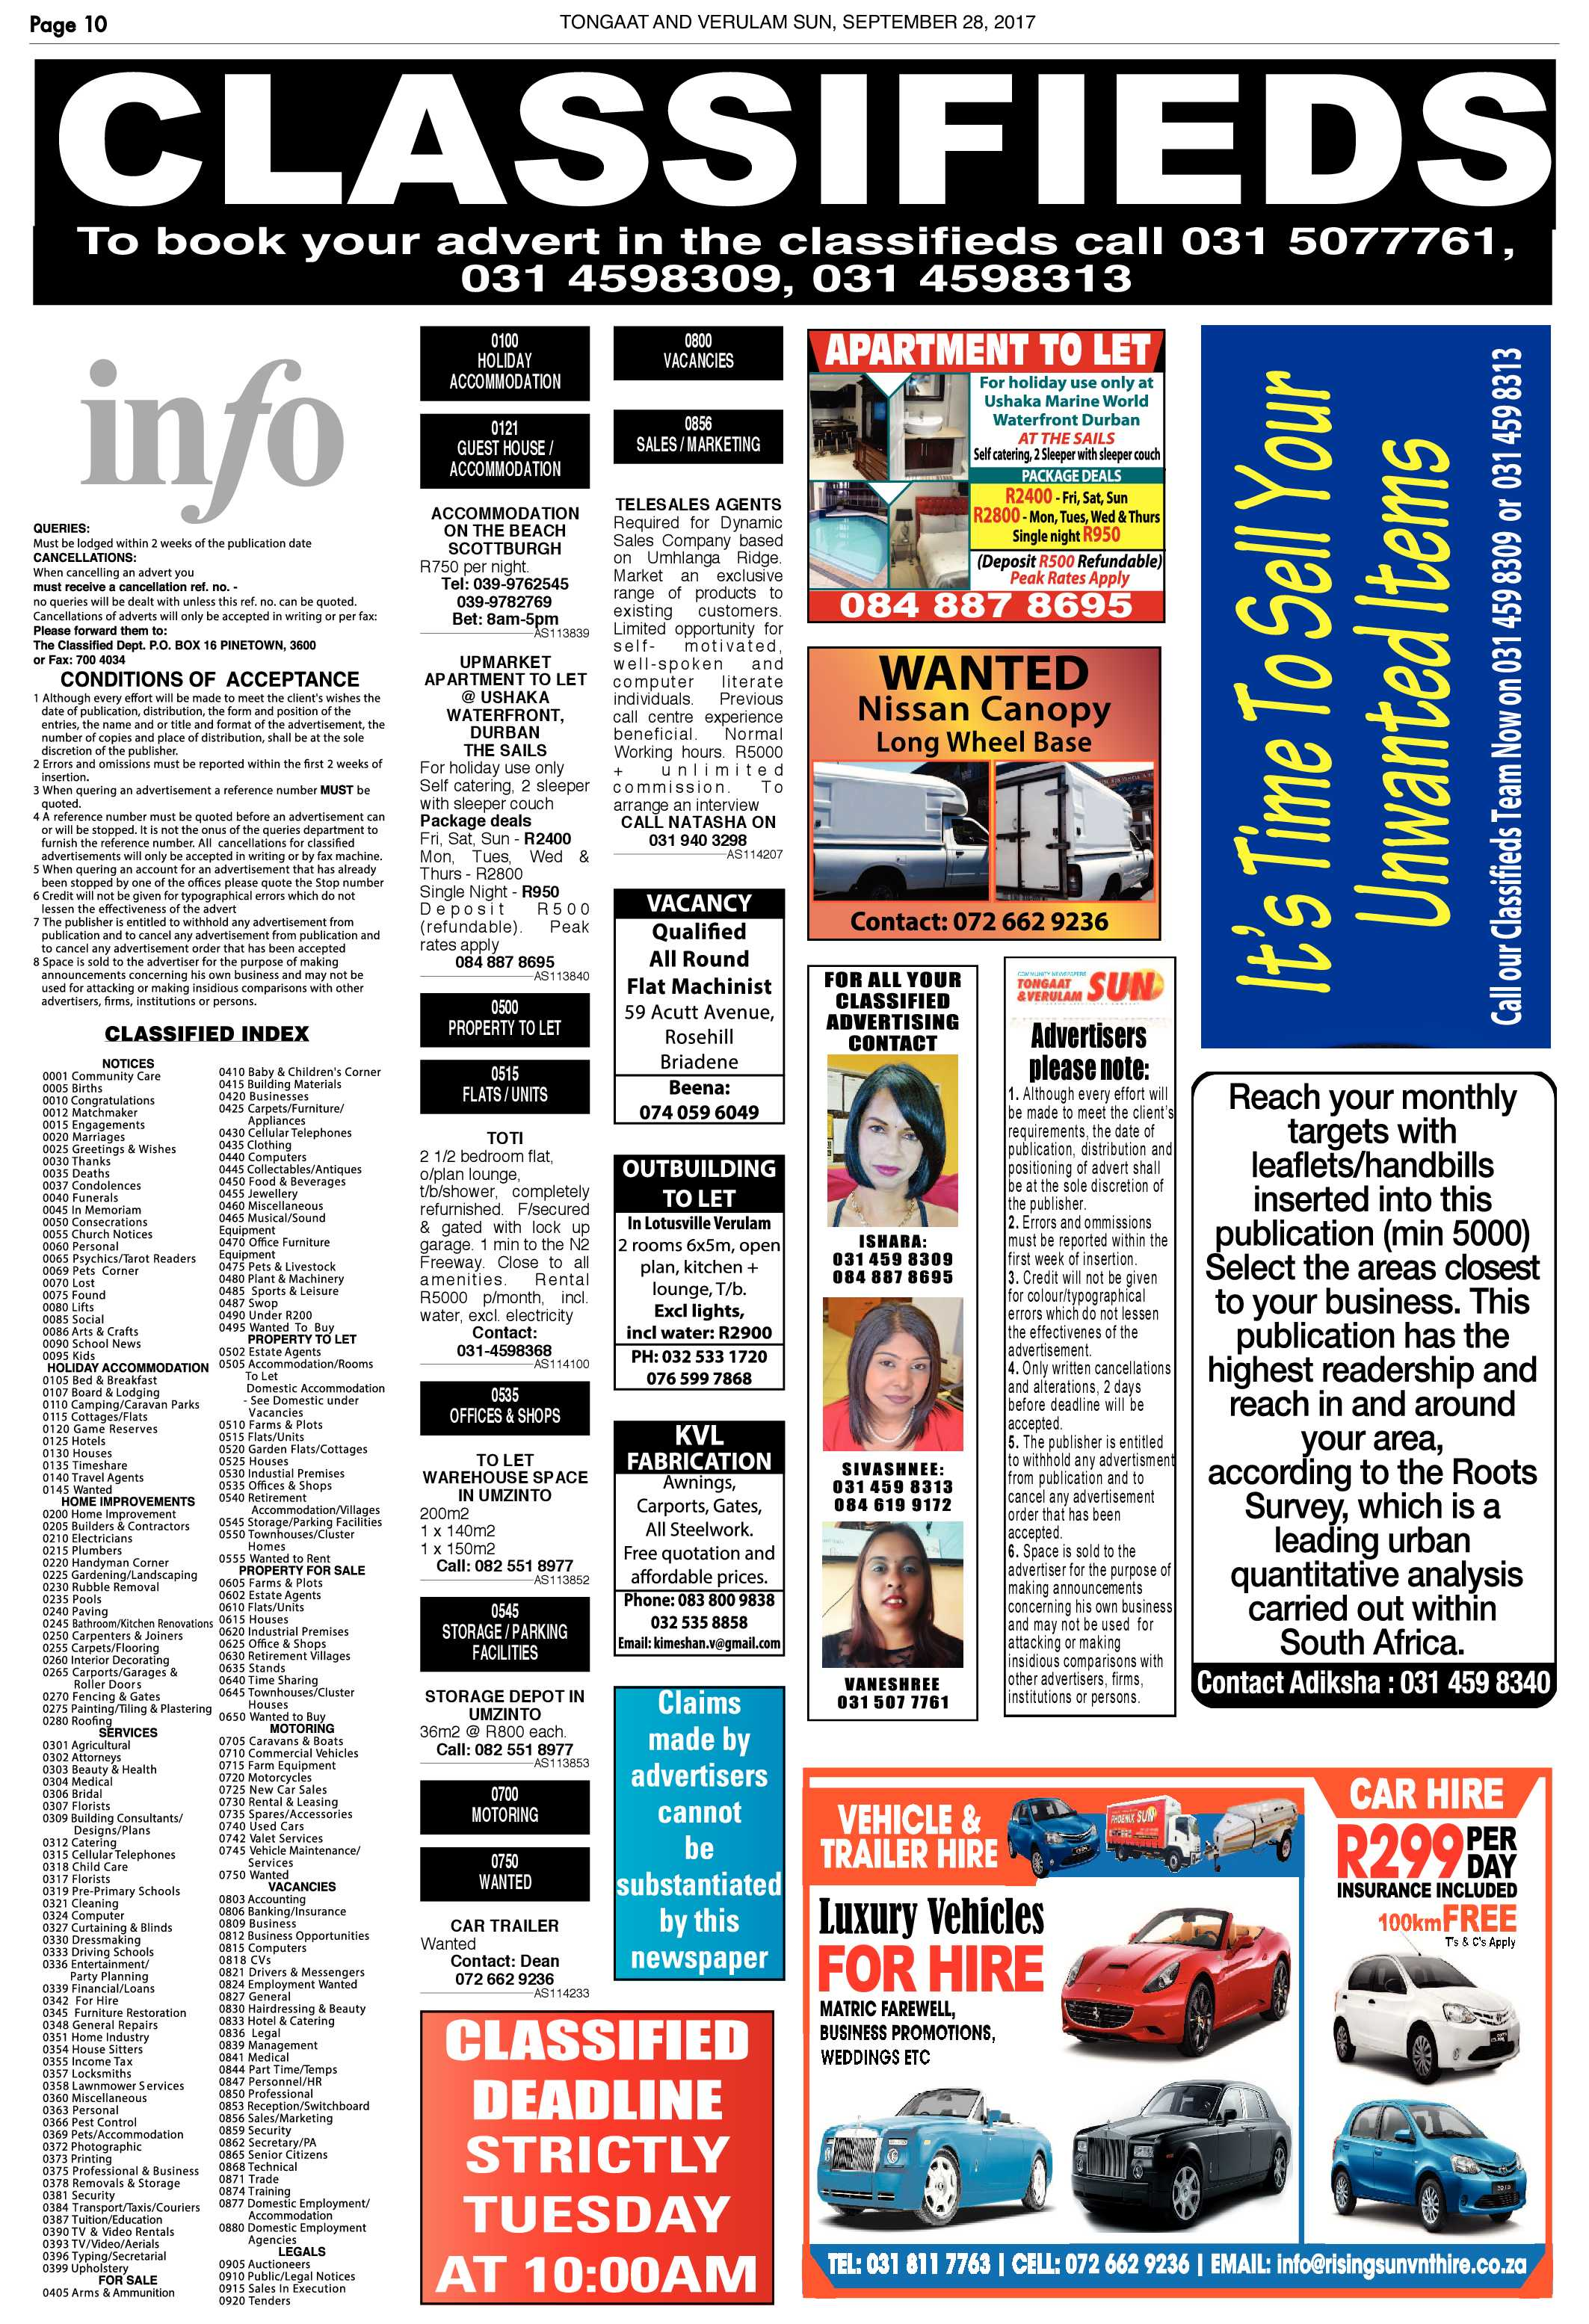 tongaat-verulam-sun-september-28-epapers-page-10